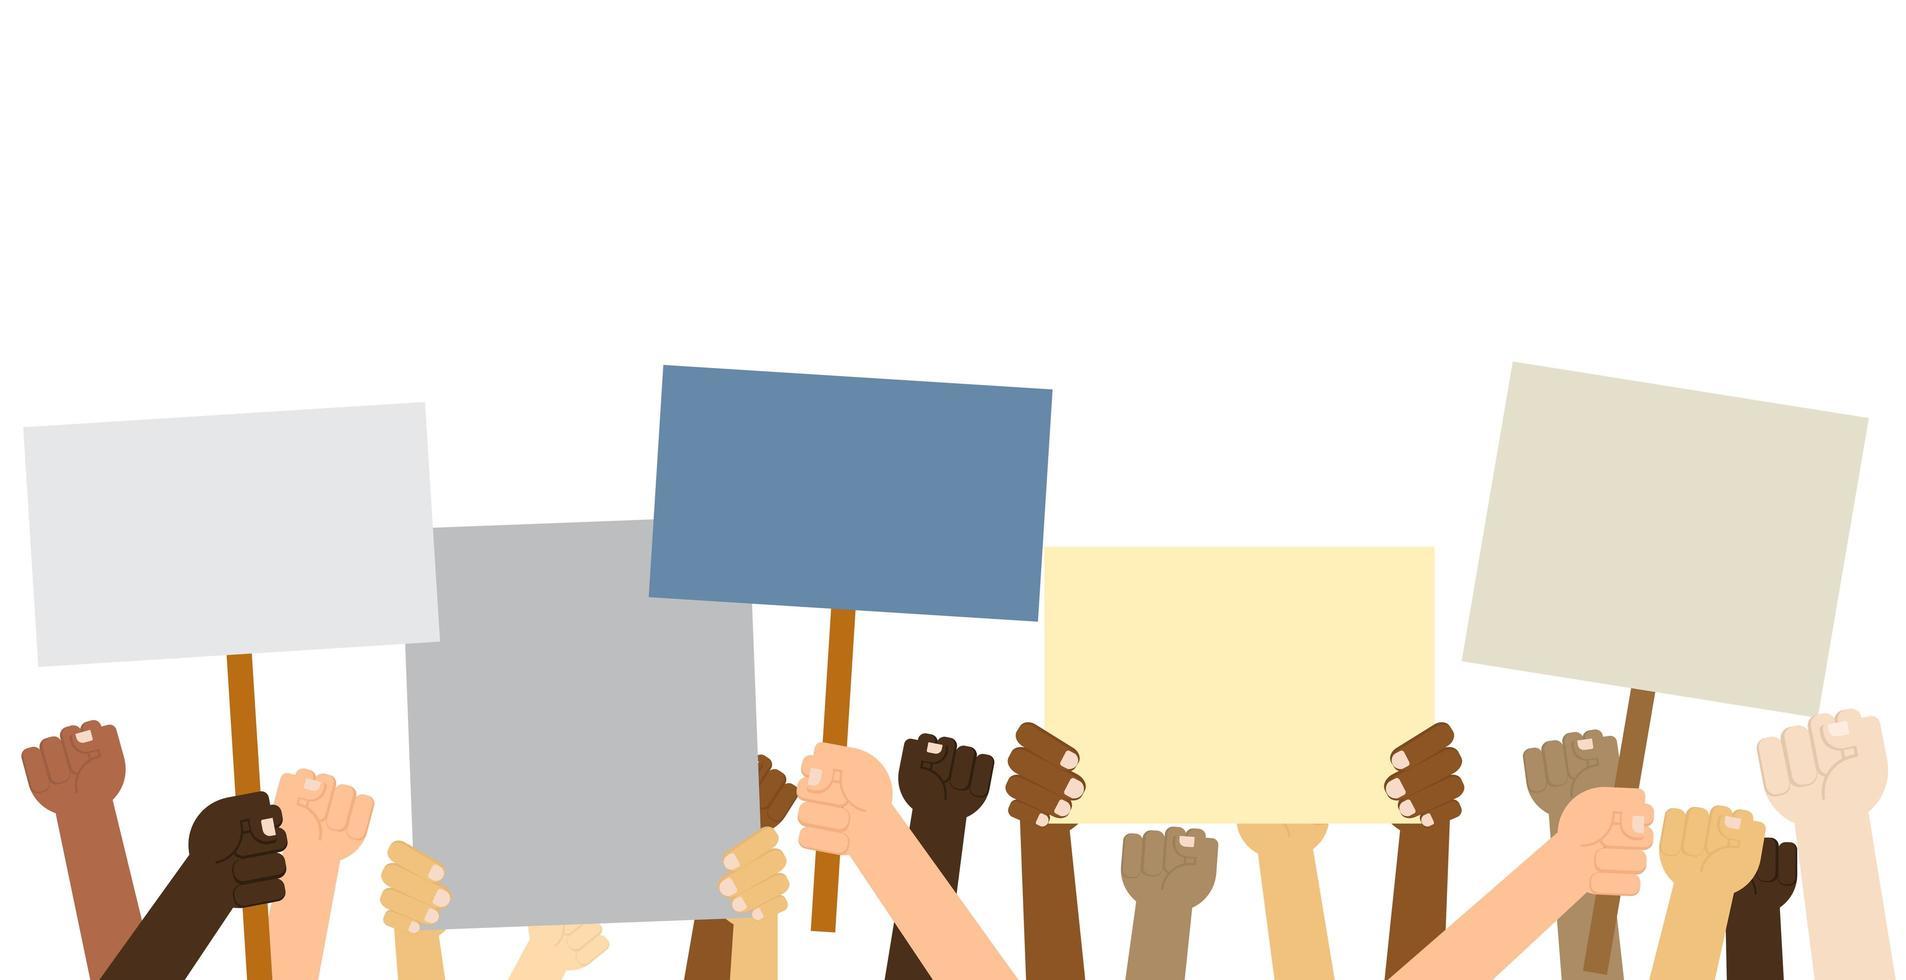 Hände halten Protestplakate vektor